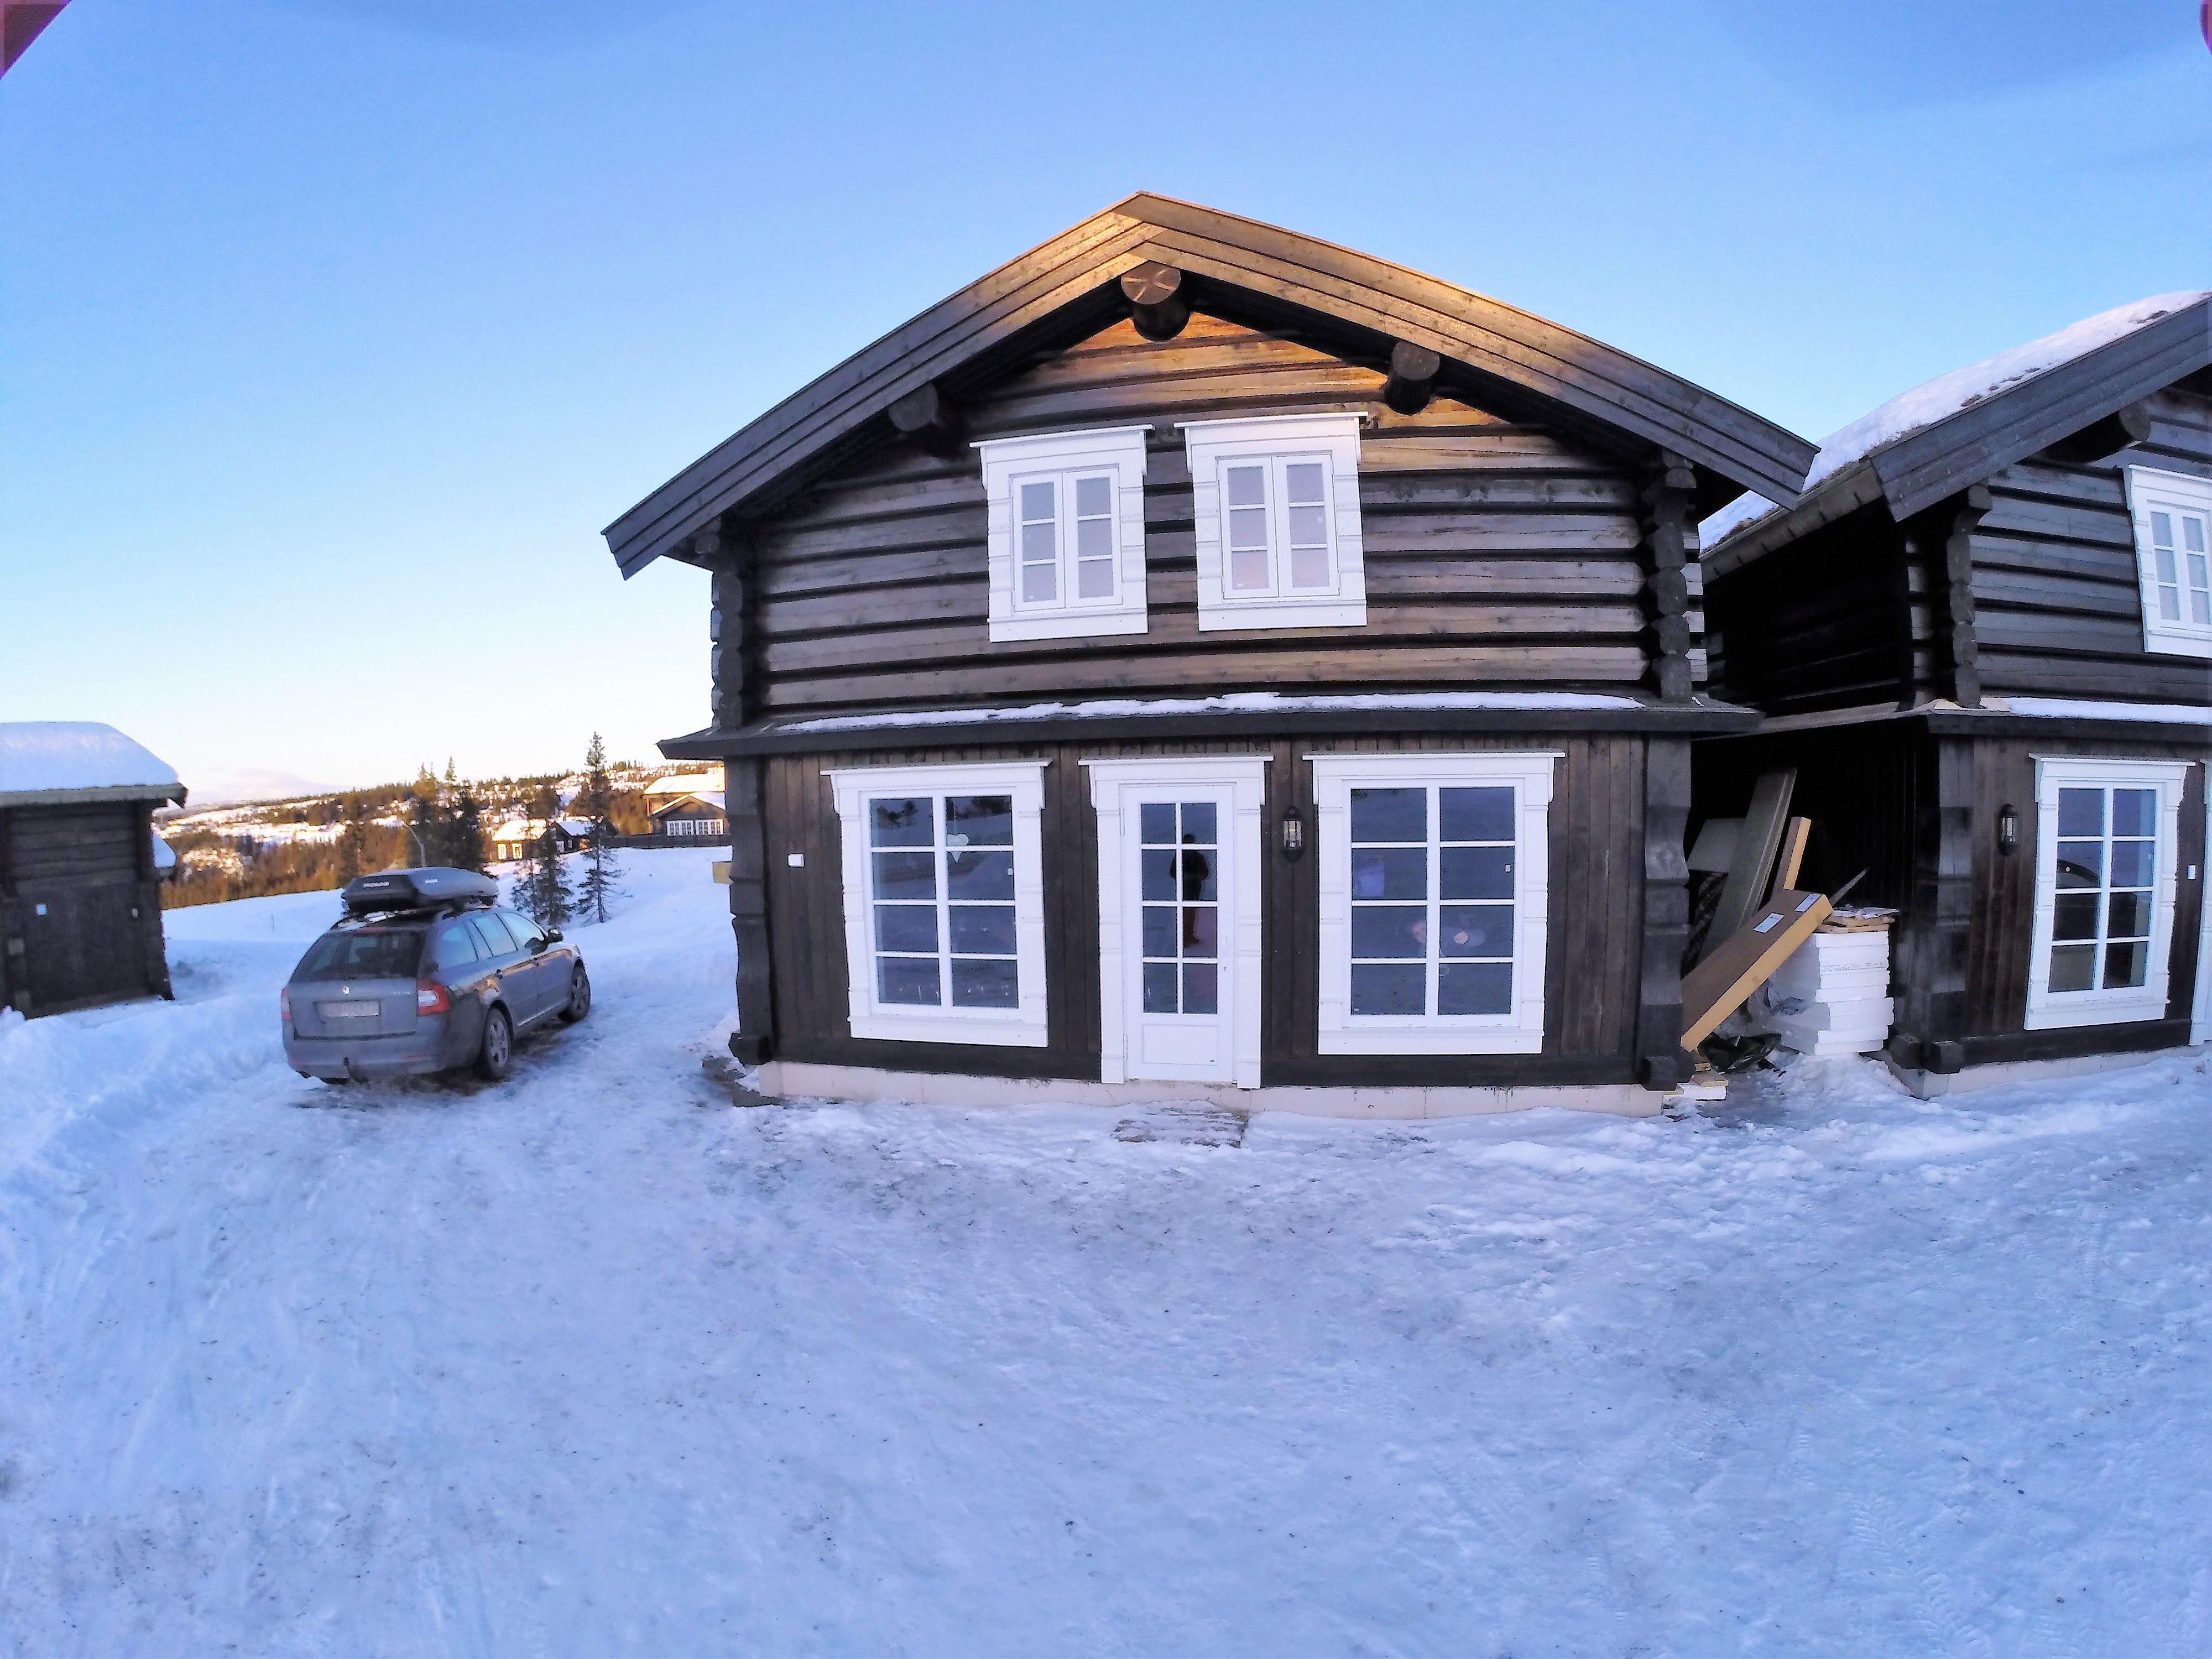 Mosetervegen 484 cottage